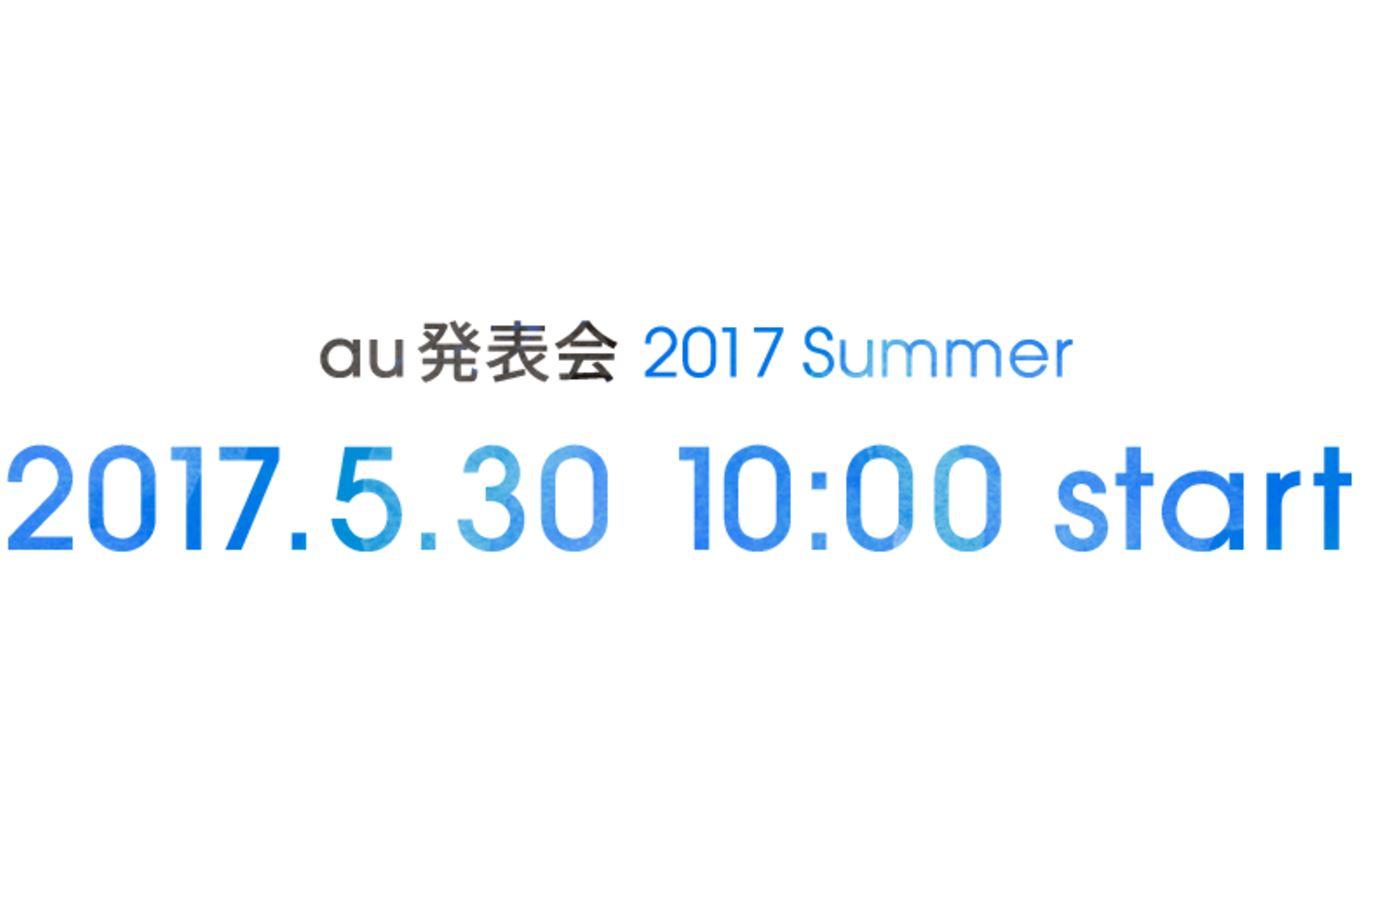 HUAWEI ジャパン、「P9 lite」にソフトウェアアップデートを5月18日より開始